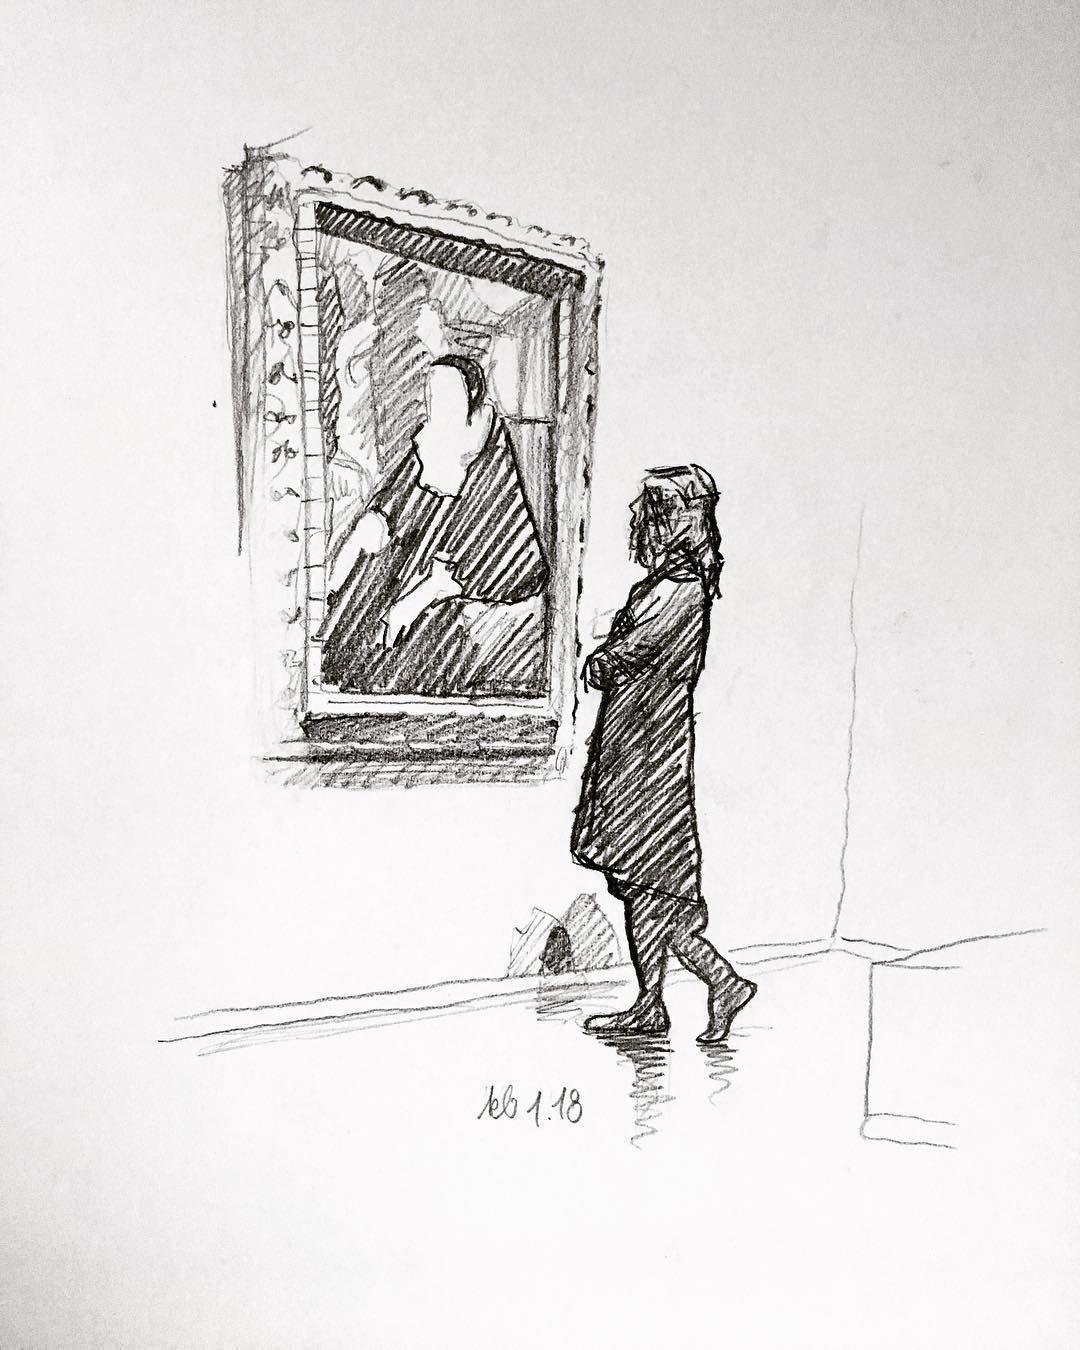 Frau im Museum, betrachtend IX. #Sunday #sonntag #trip #Drawing ...